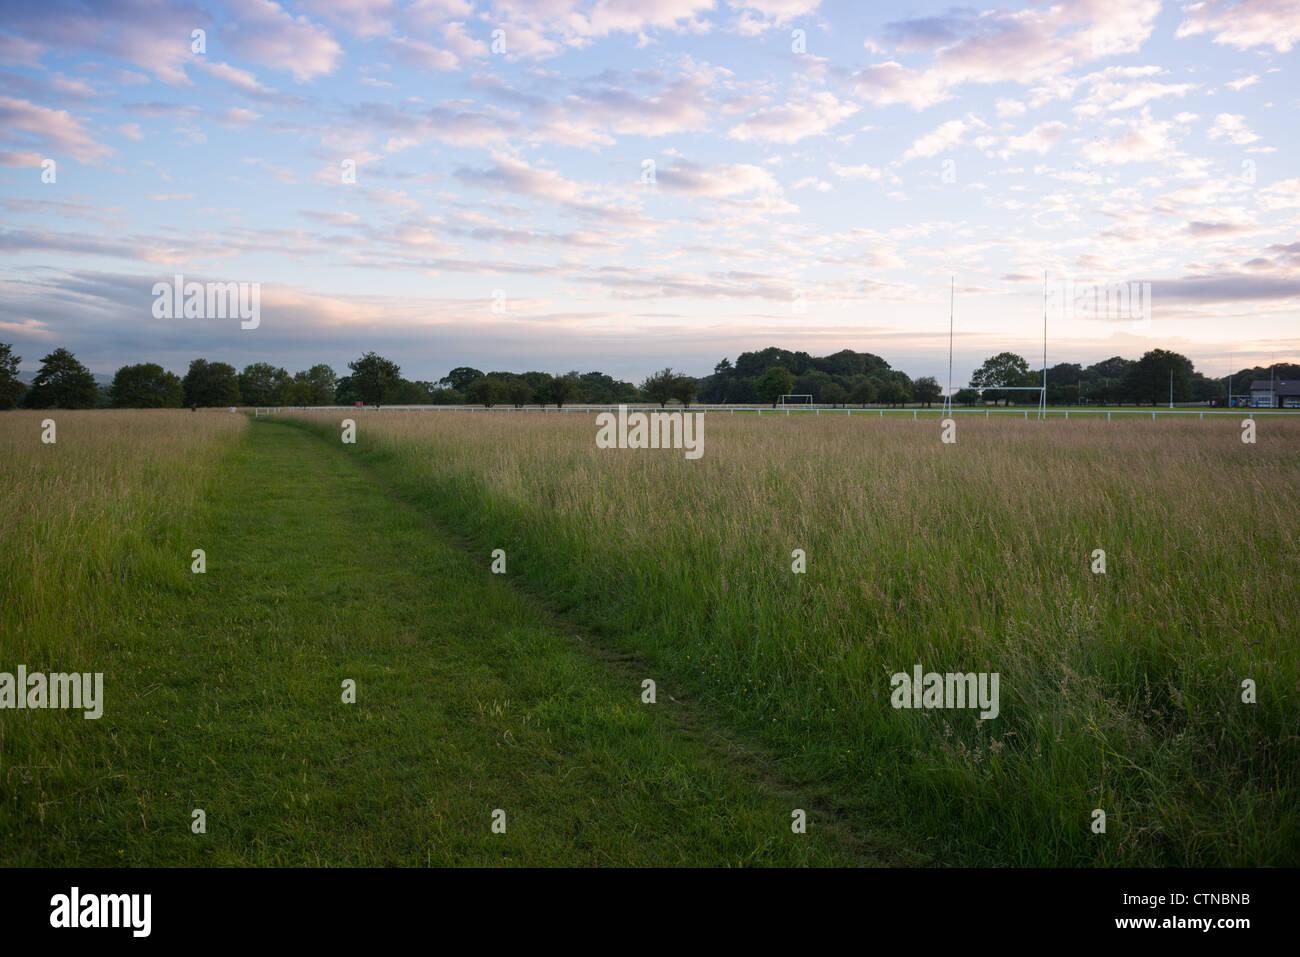 Phoenix Park, Dublin, Co Dublin, Ireland. - Stock Image